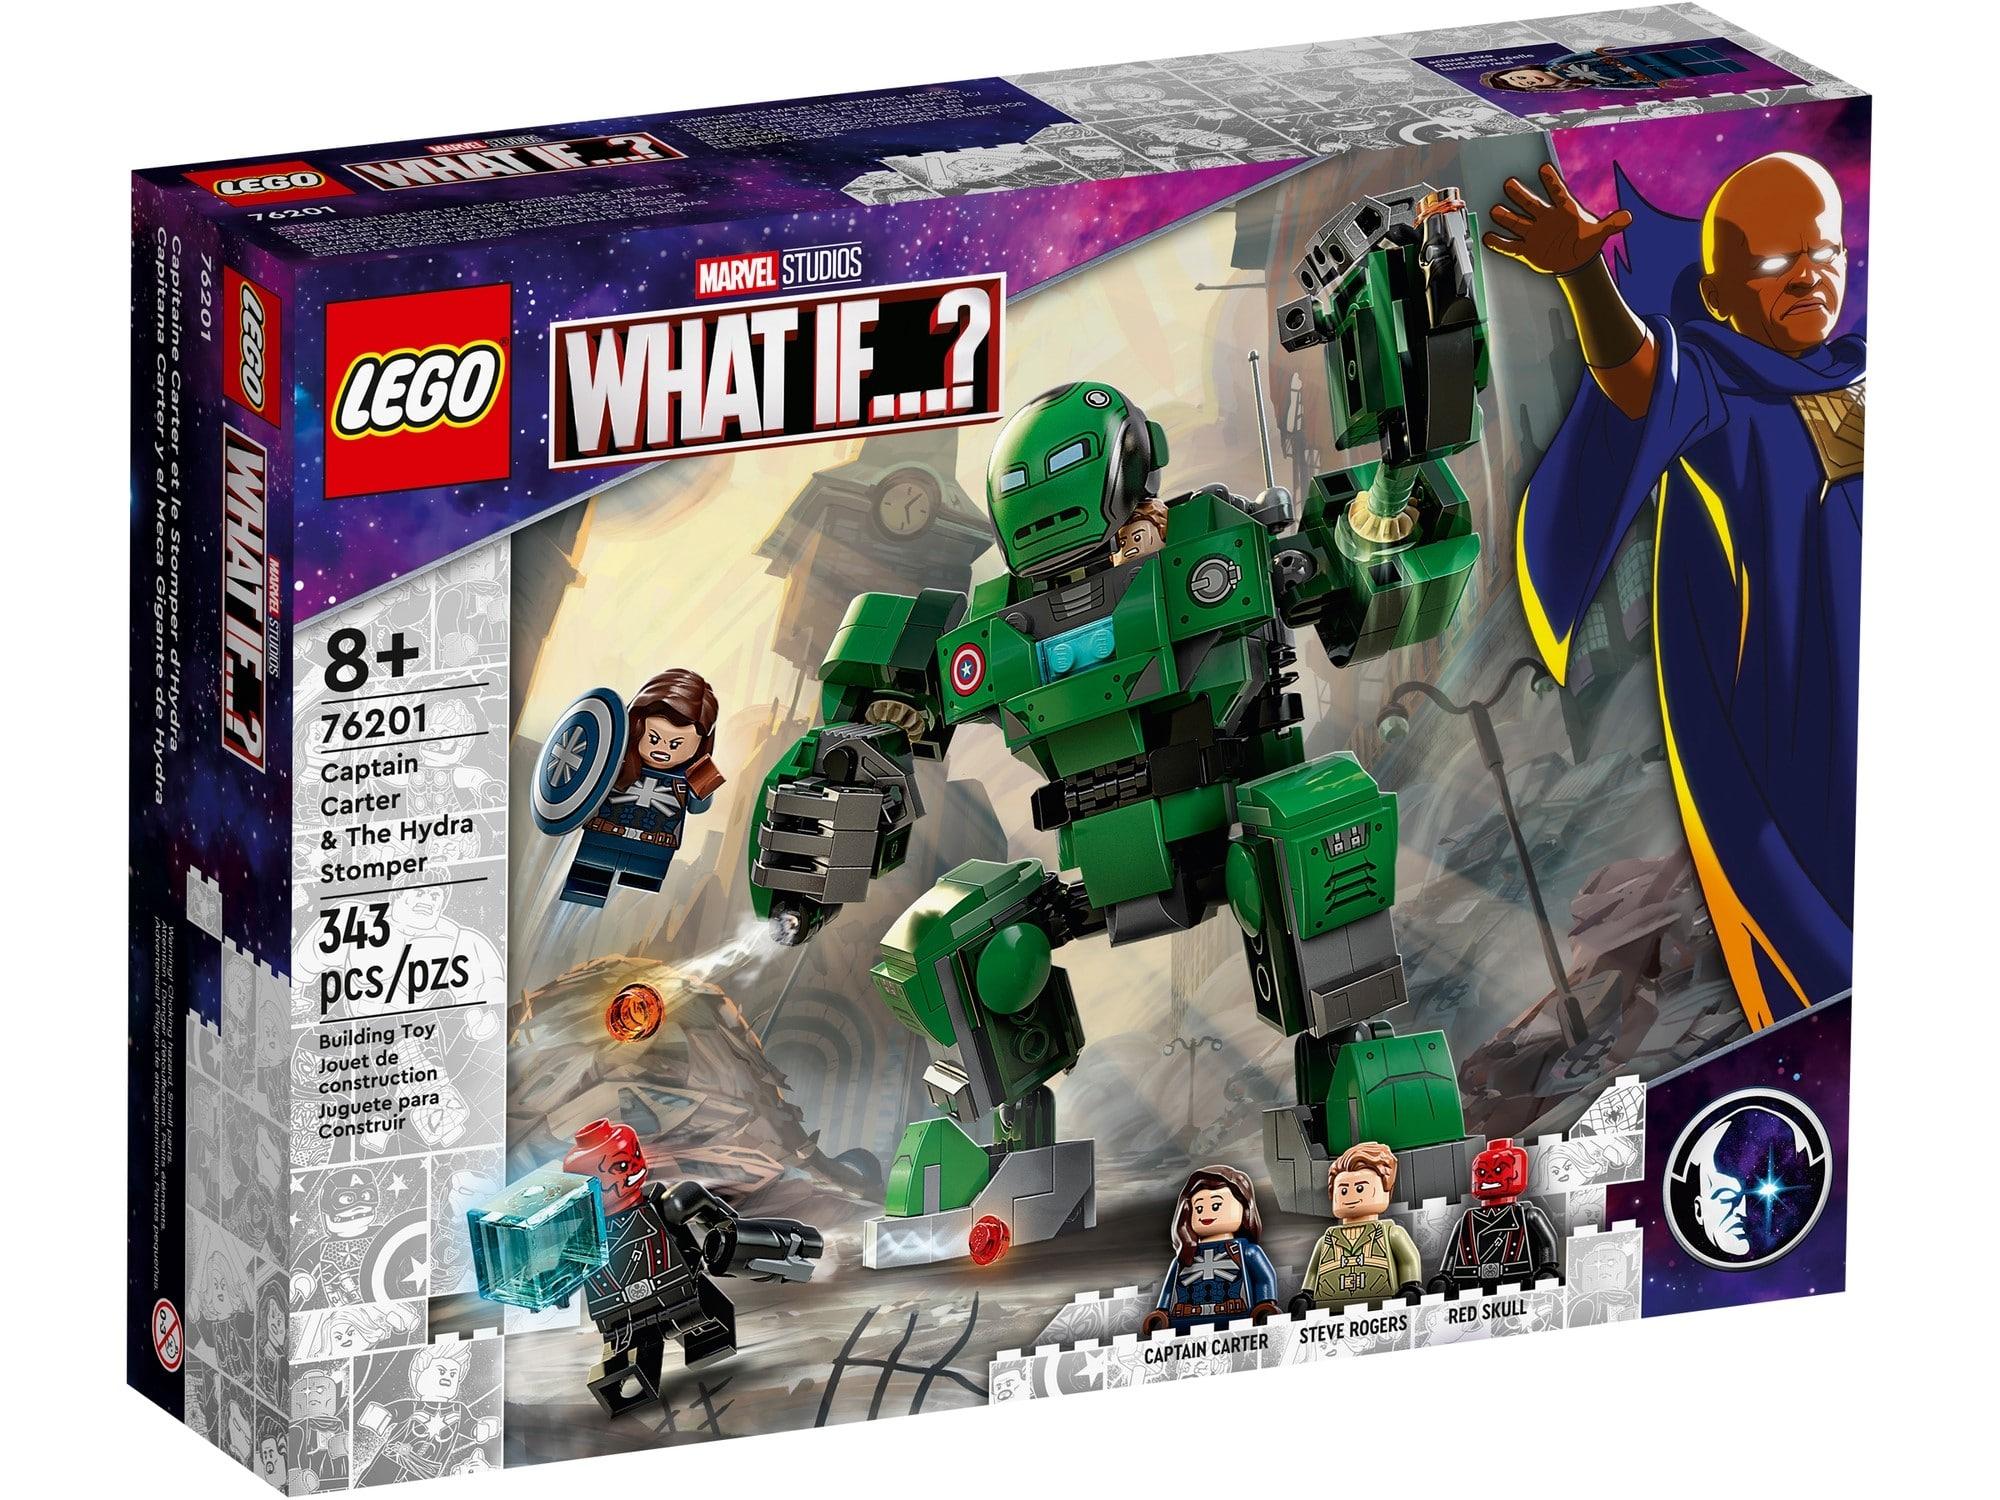 LEGO Marvel 76201 Captain Carter & The Hydra Stomper 1